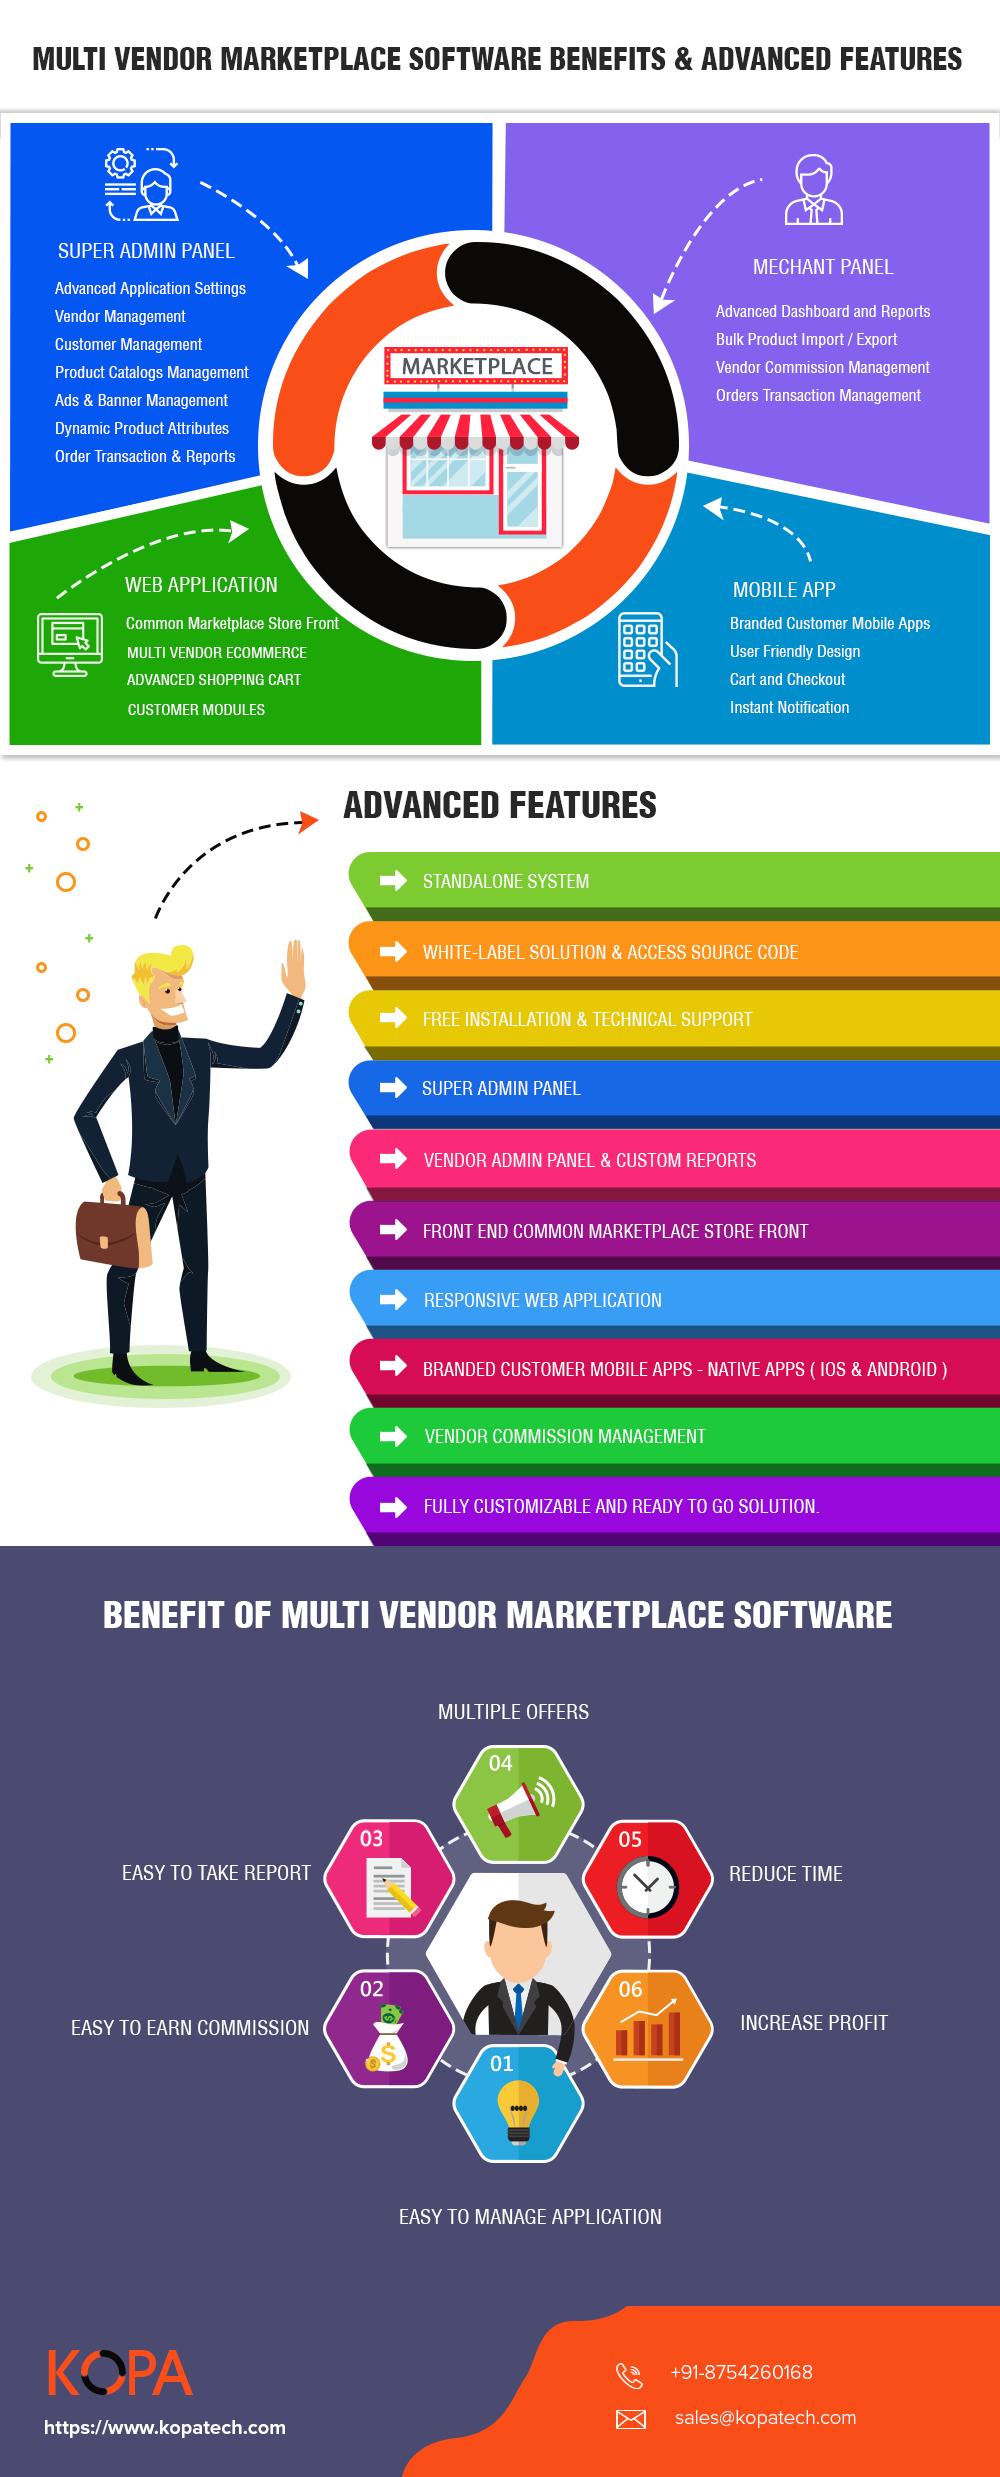 Multi Vendor Marketplace Software - Benefits & Features